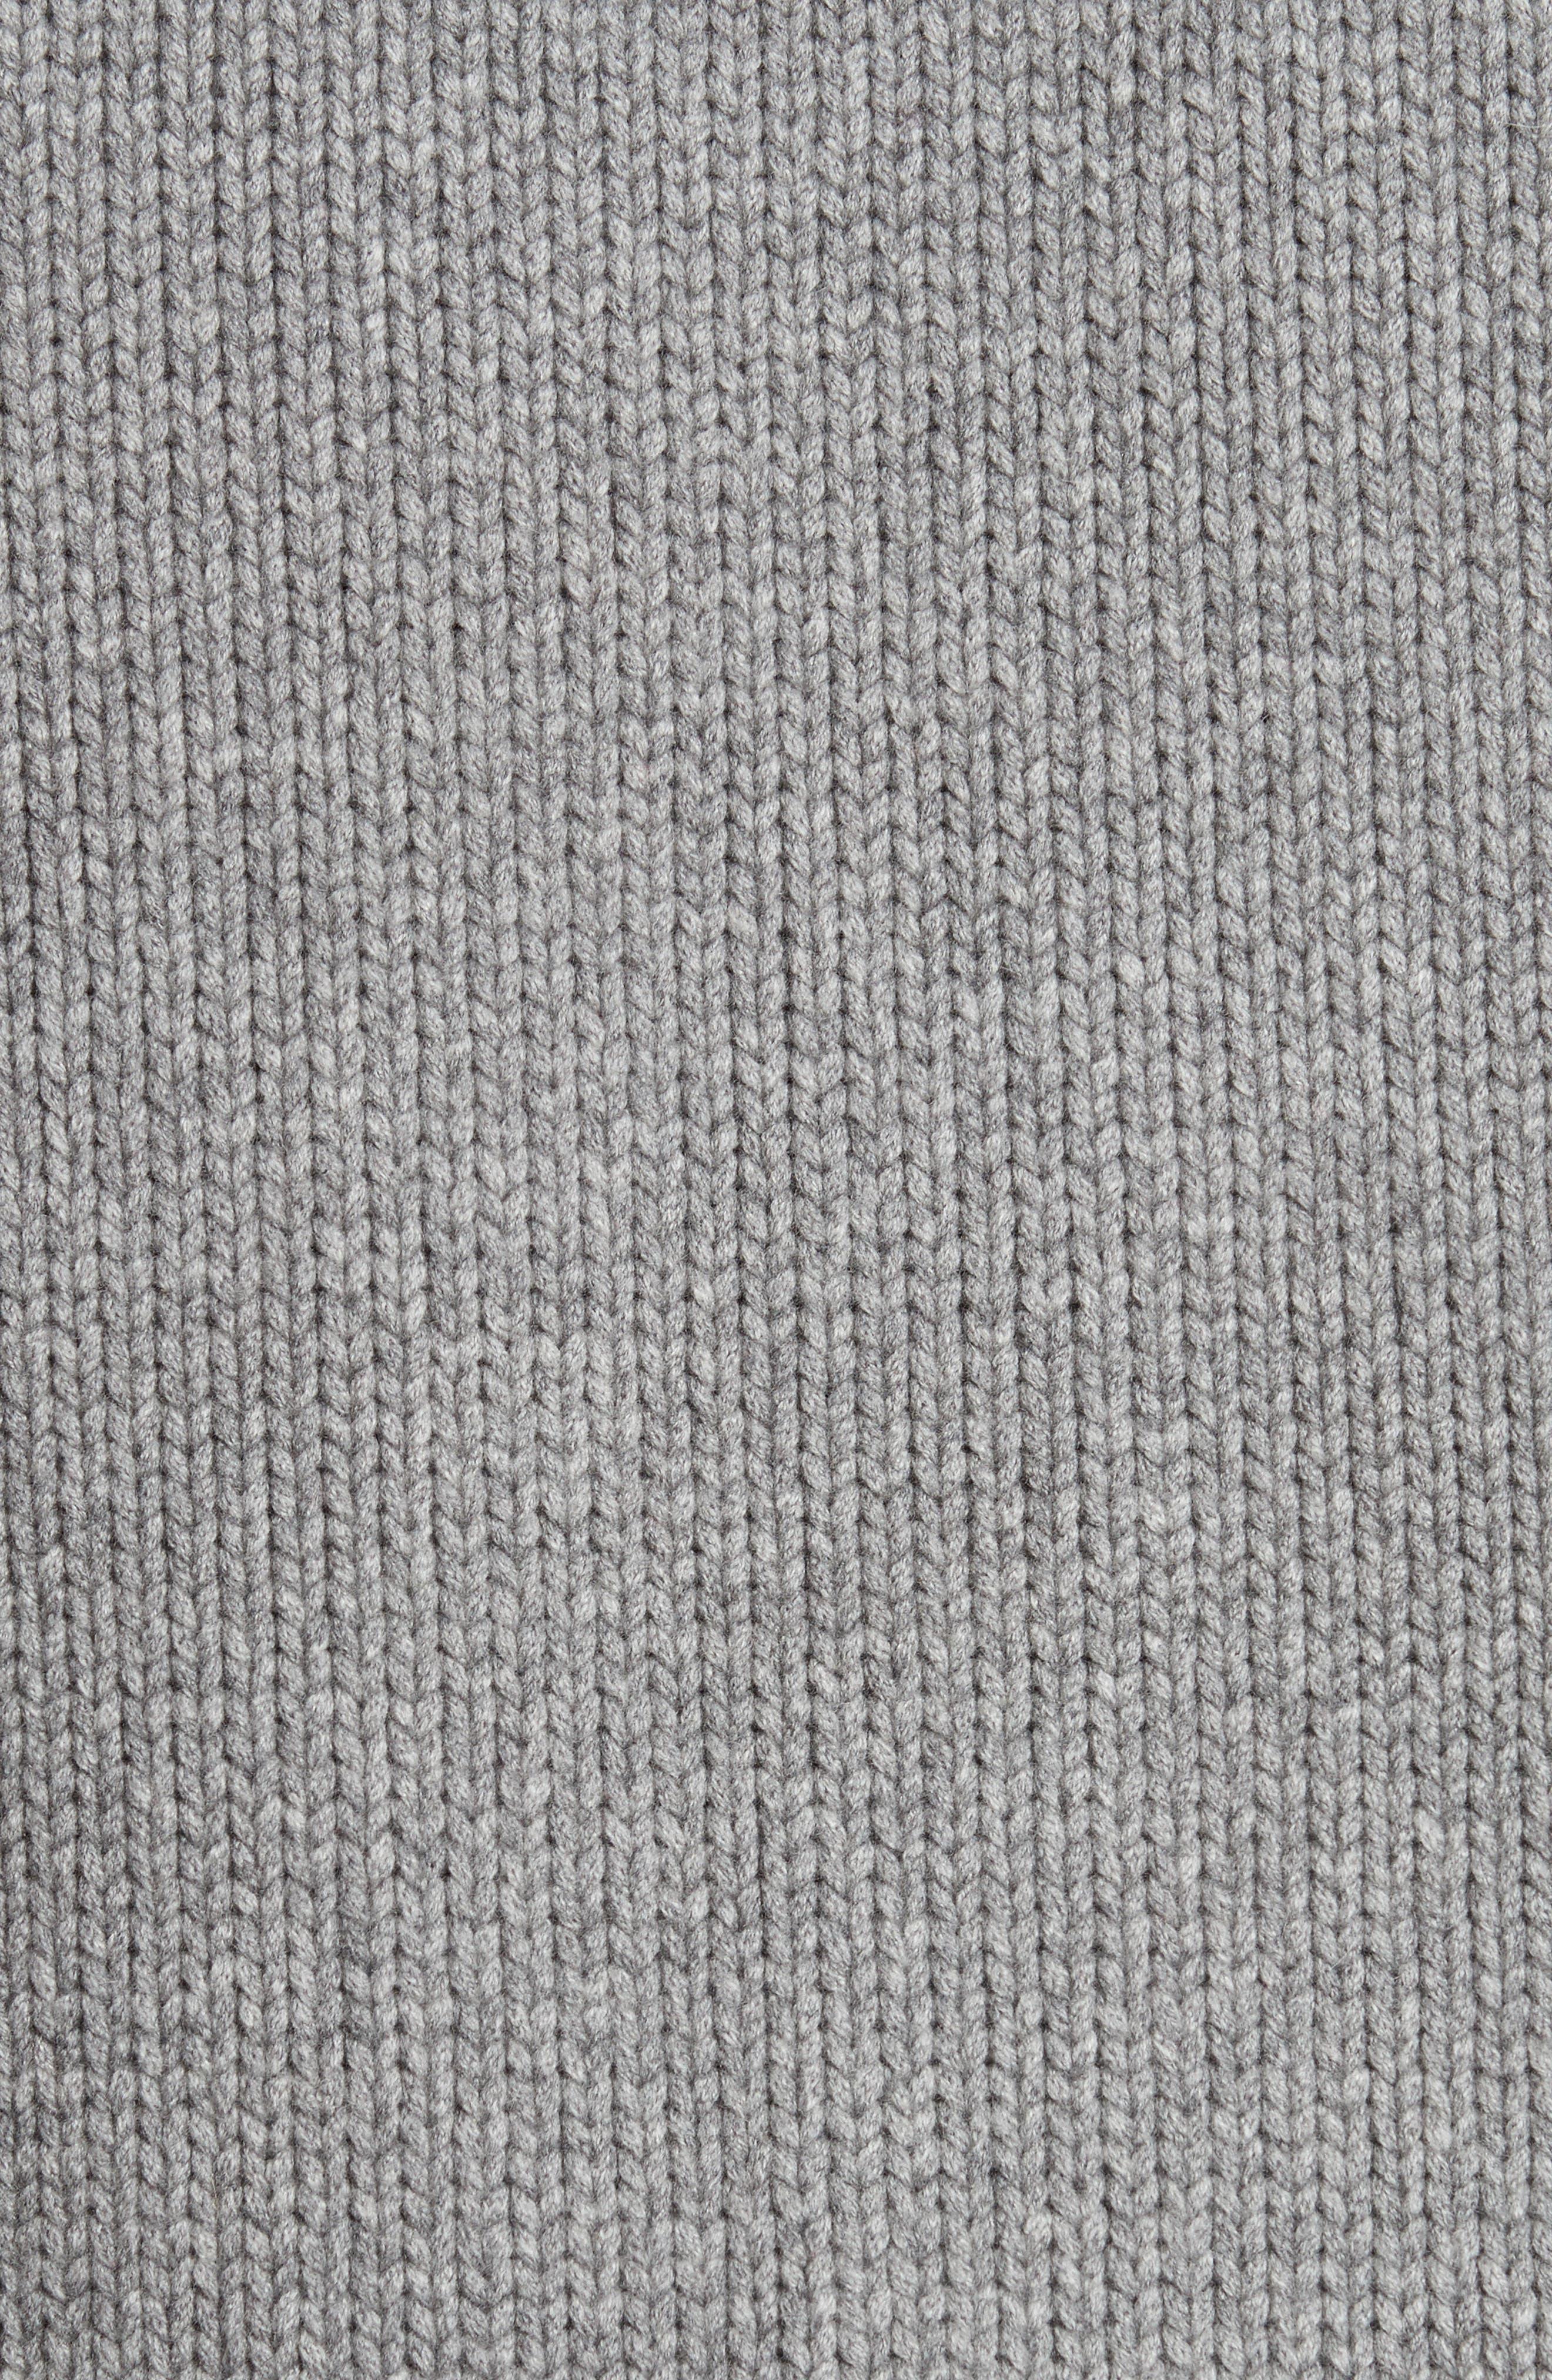 Caldwell Wool & Cashmere Cardigan,                             Alternate thumbnail 5, color,                             Mid Grey Melange